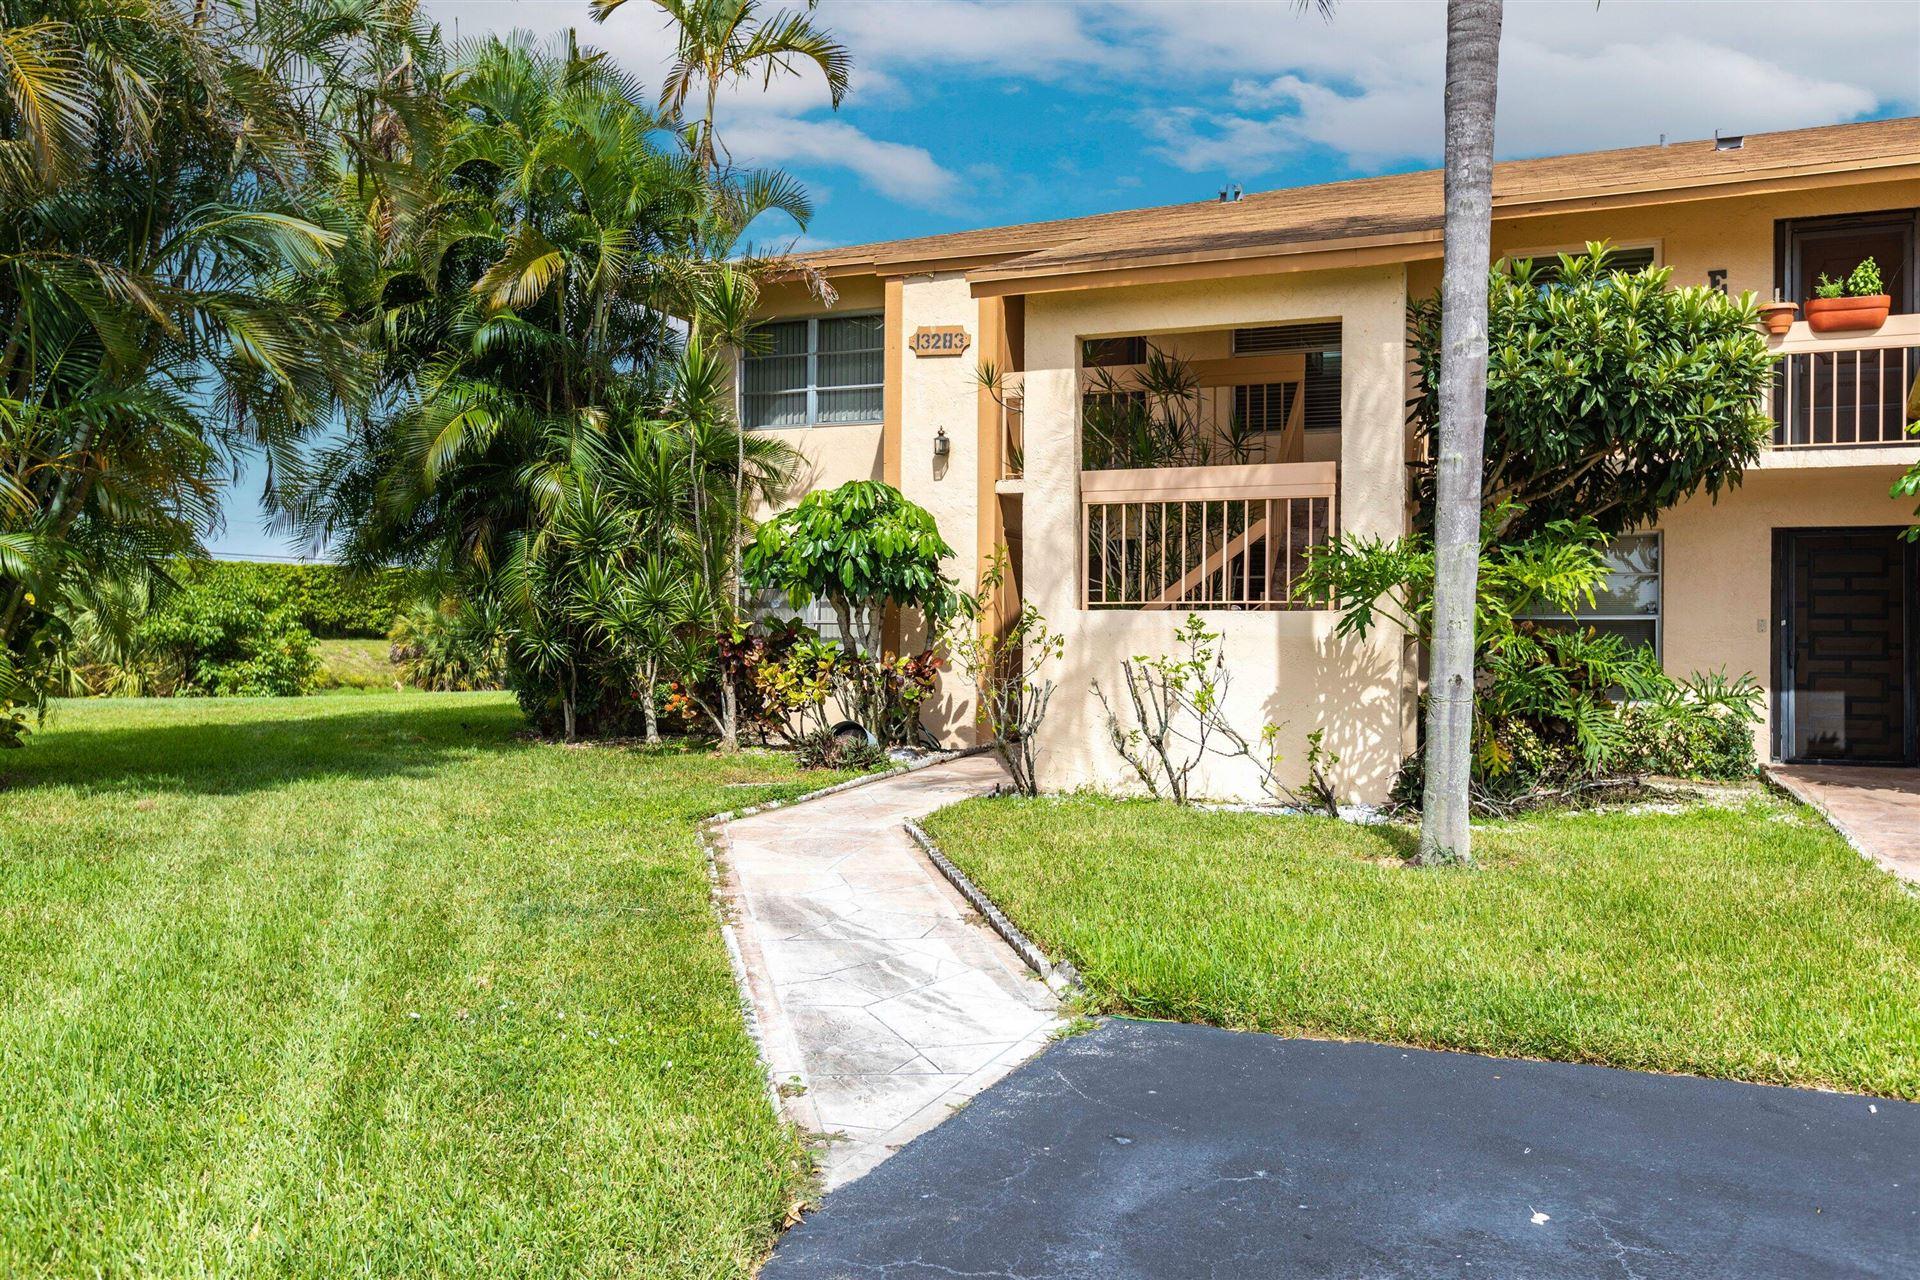 13283 Pineapple Palm Court #D, Delray Beach, FL 33484 - #: RX-10753053